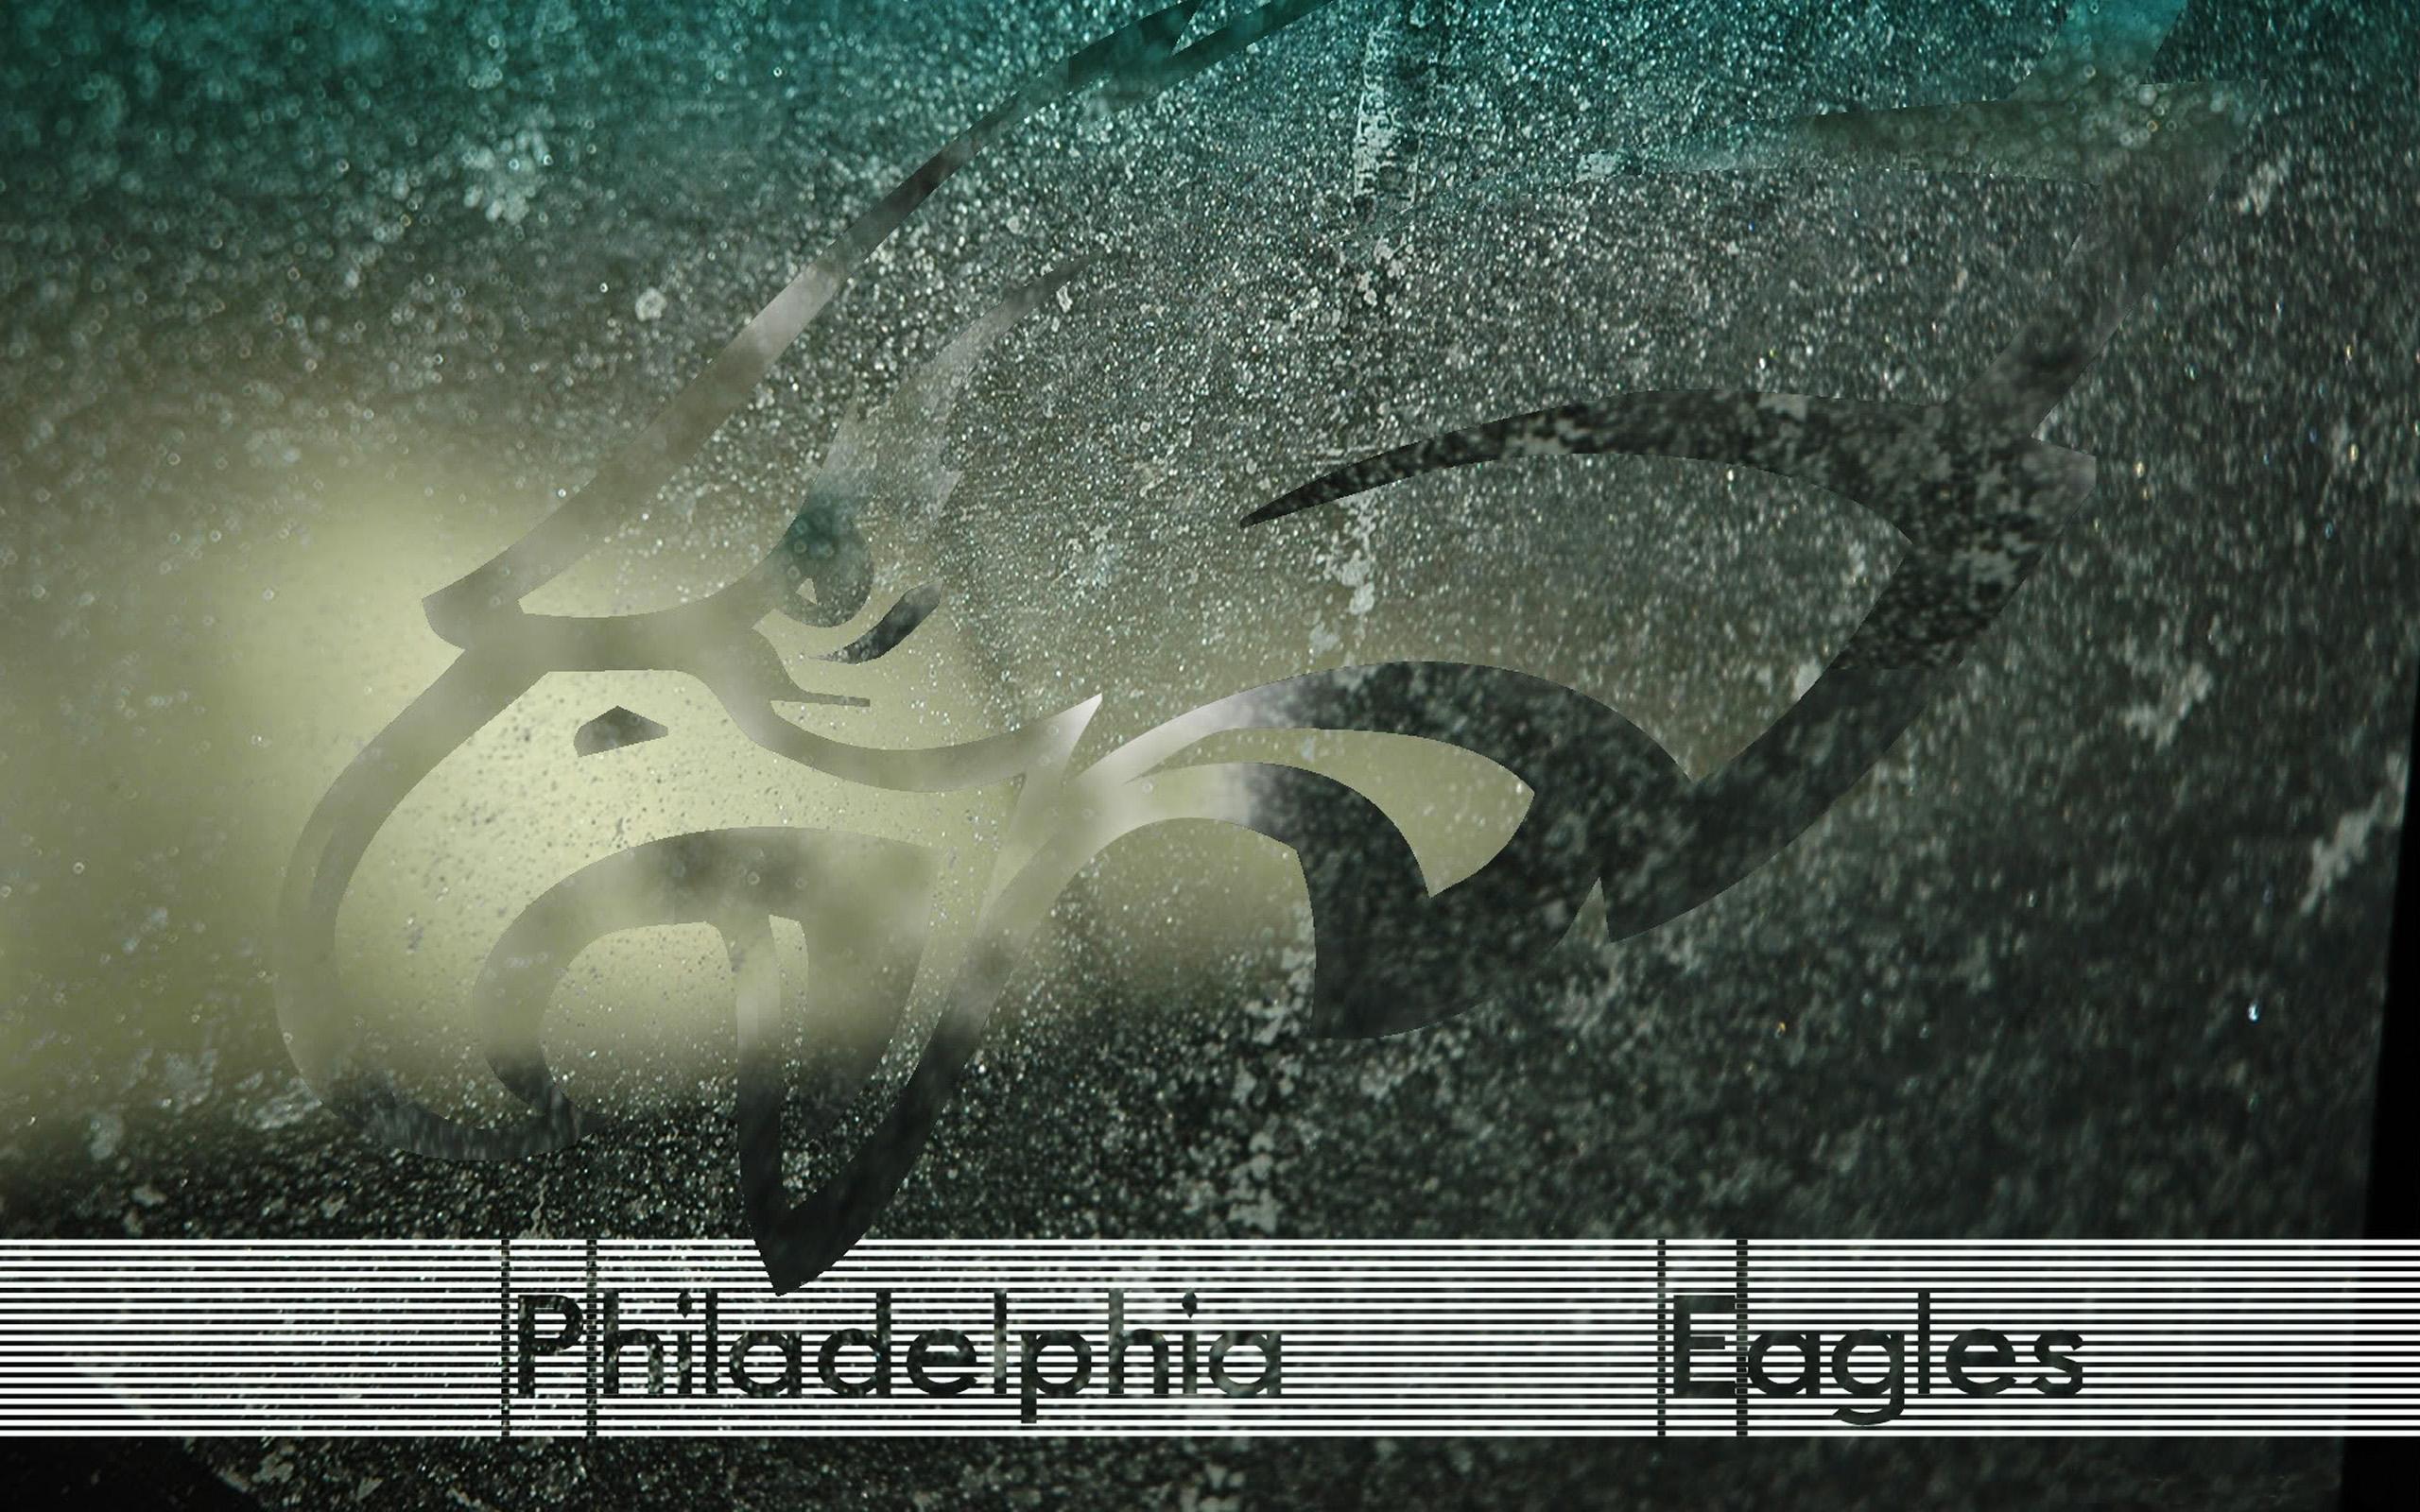 Philadelphia Eagles Computer Wallpapers Desktop Backgrounds 2560x1600